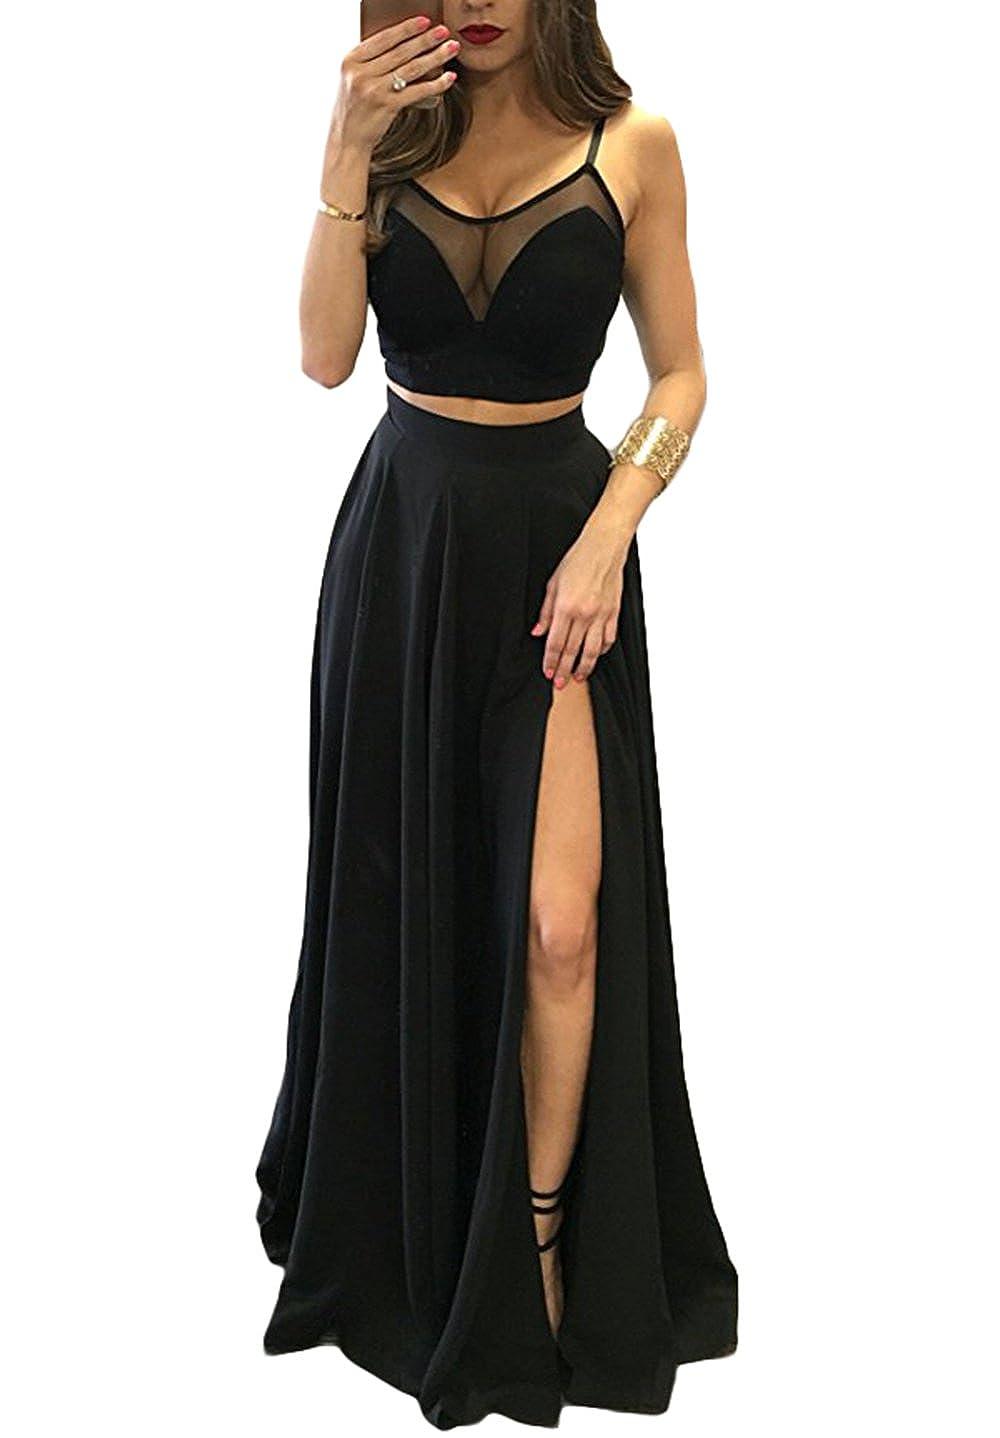 7cbc949cd48 Top 10 wholesale 1 Piece Long Dress - Chinabrands.com